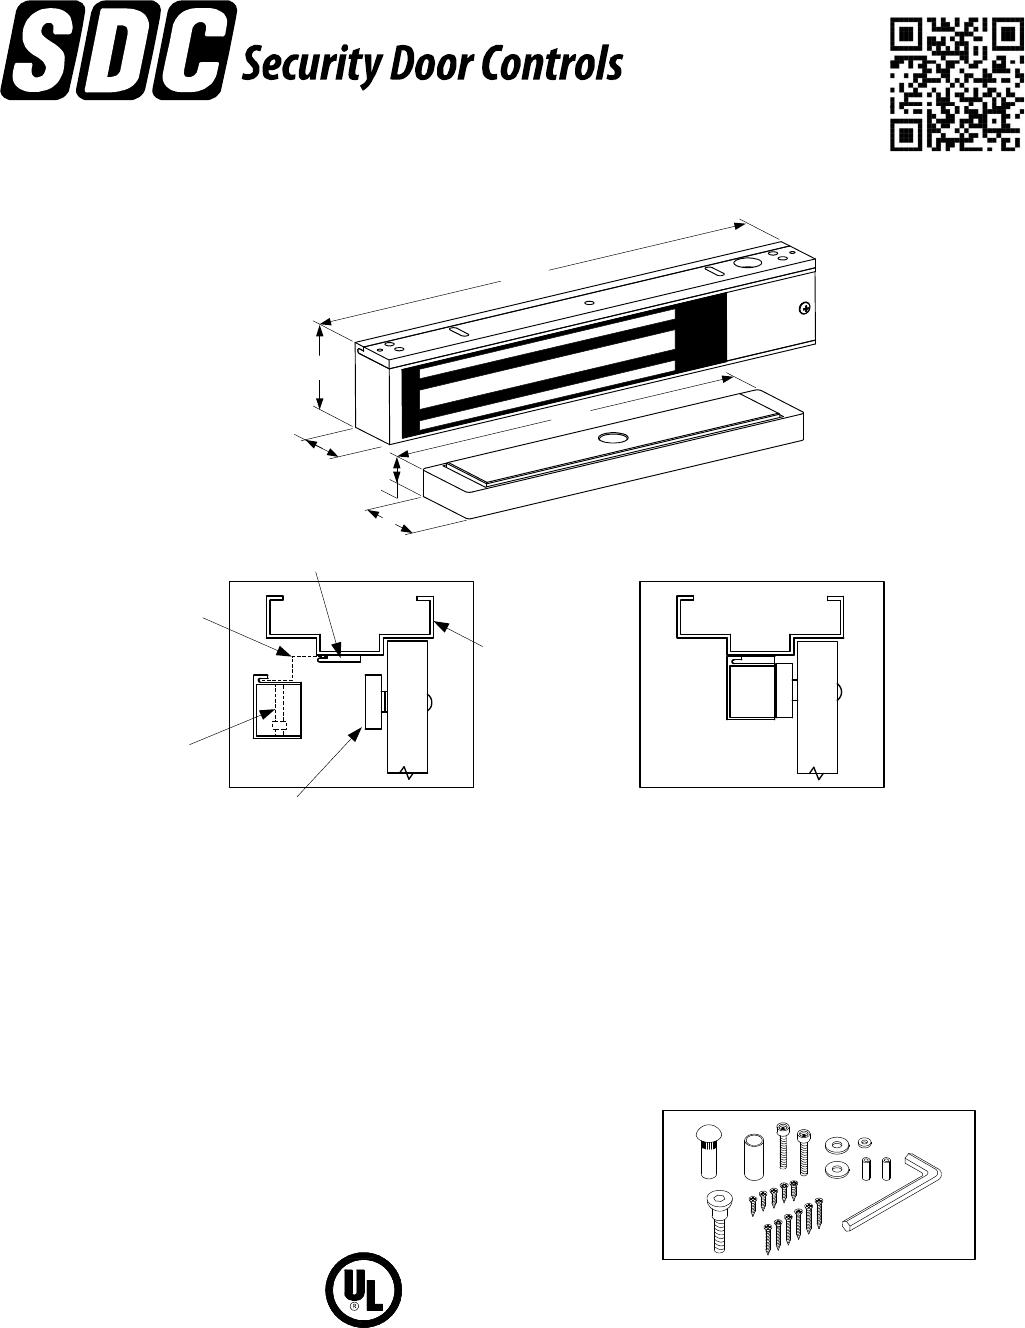 Sdc Inst 350 Narrow Line Magnetic Lock Installation Instructions Locknetics Maglock Wiring Diagram